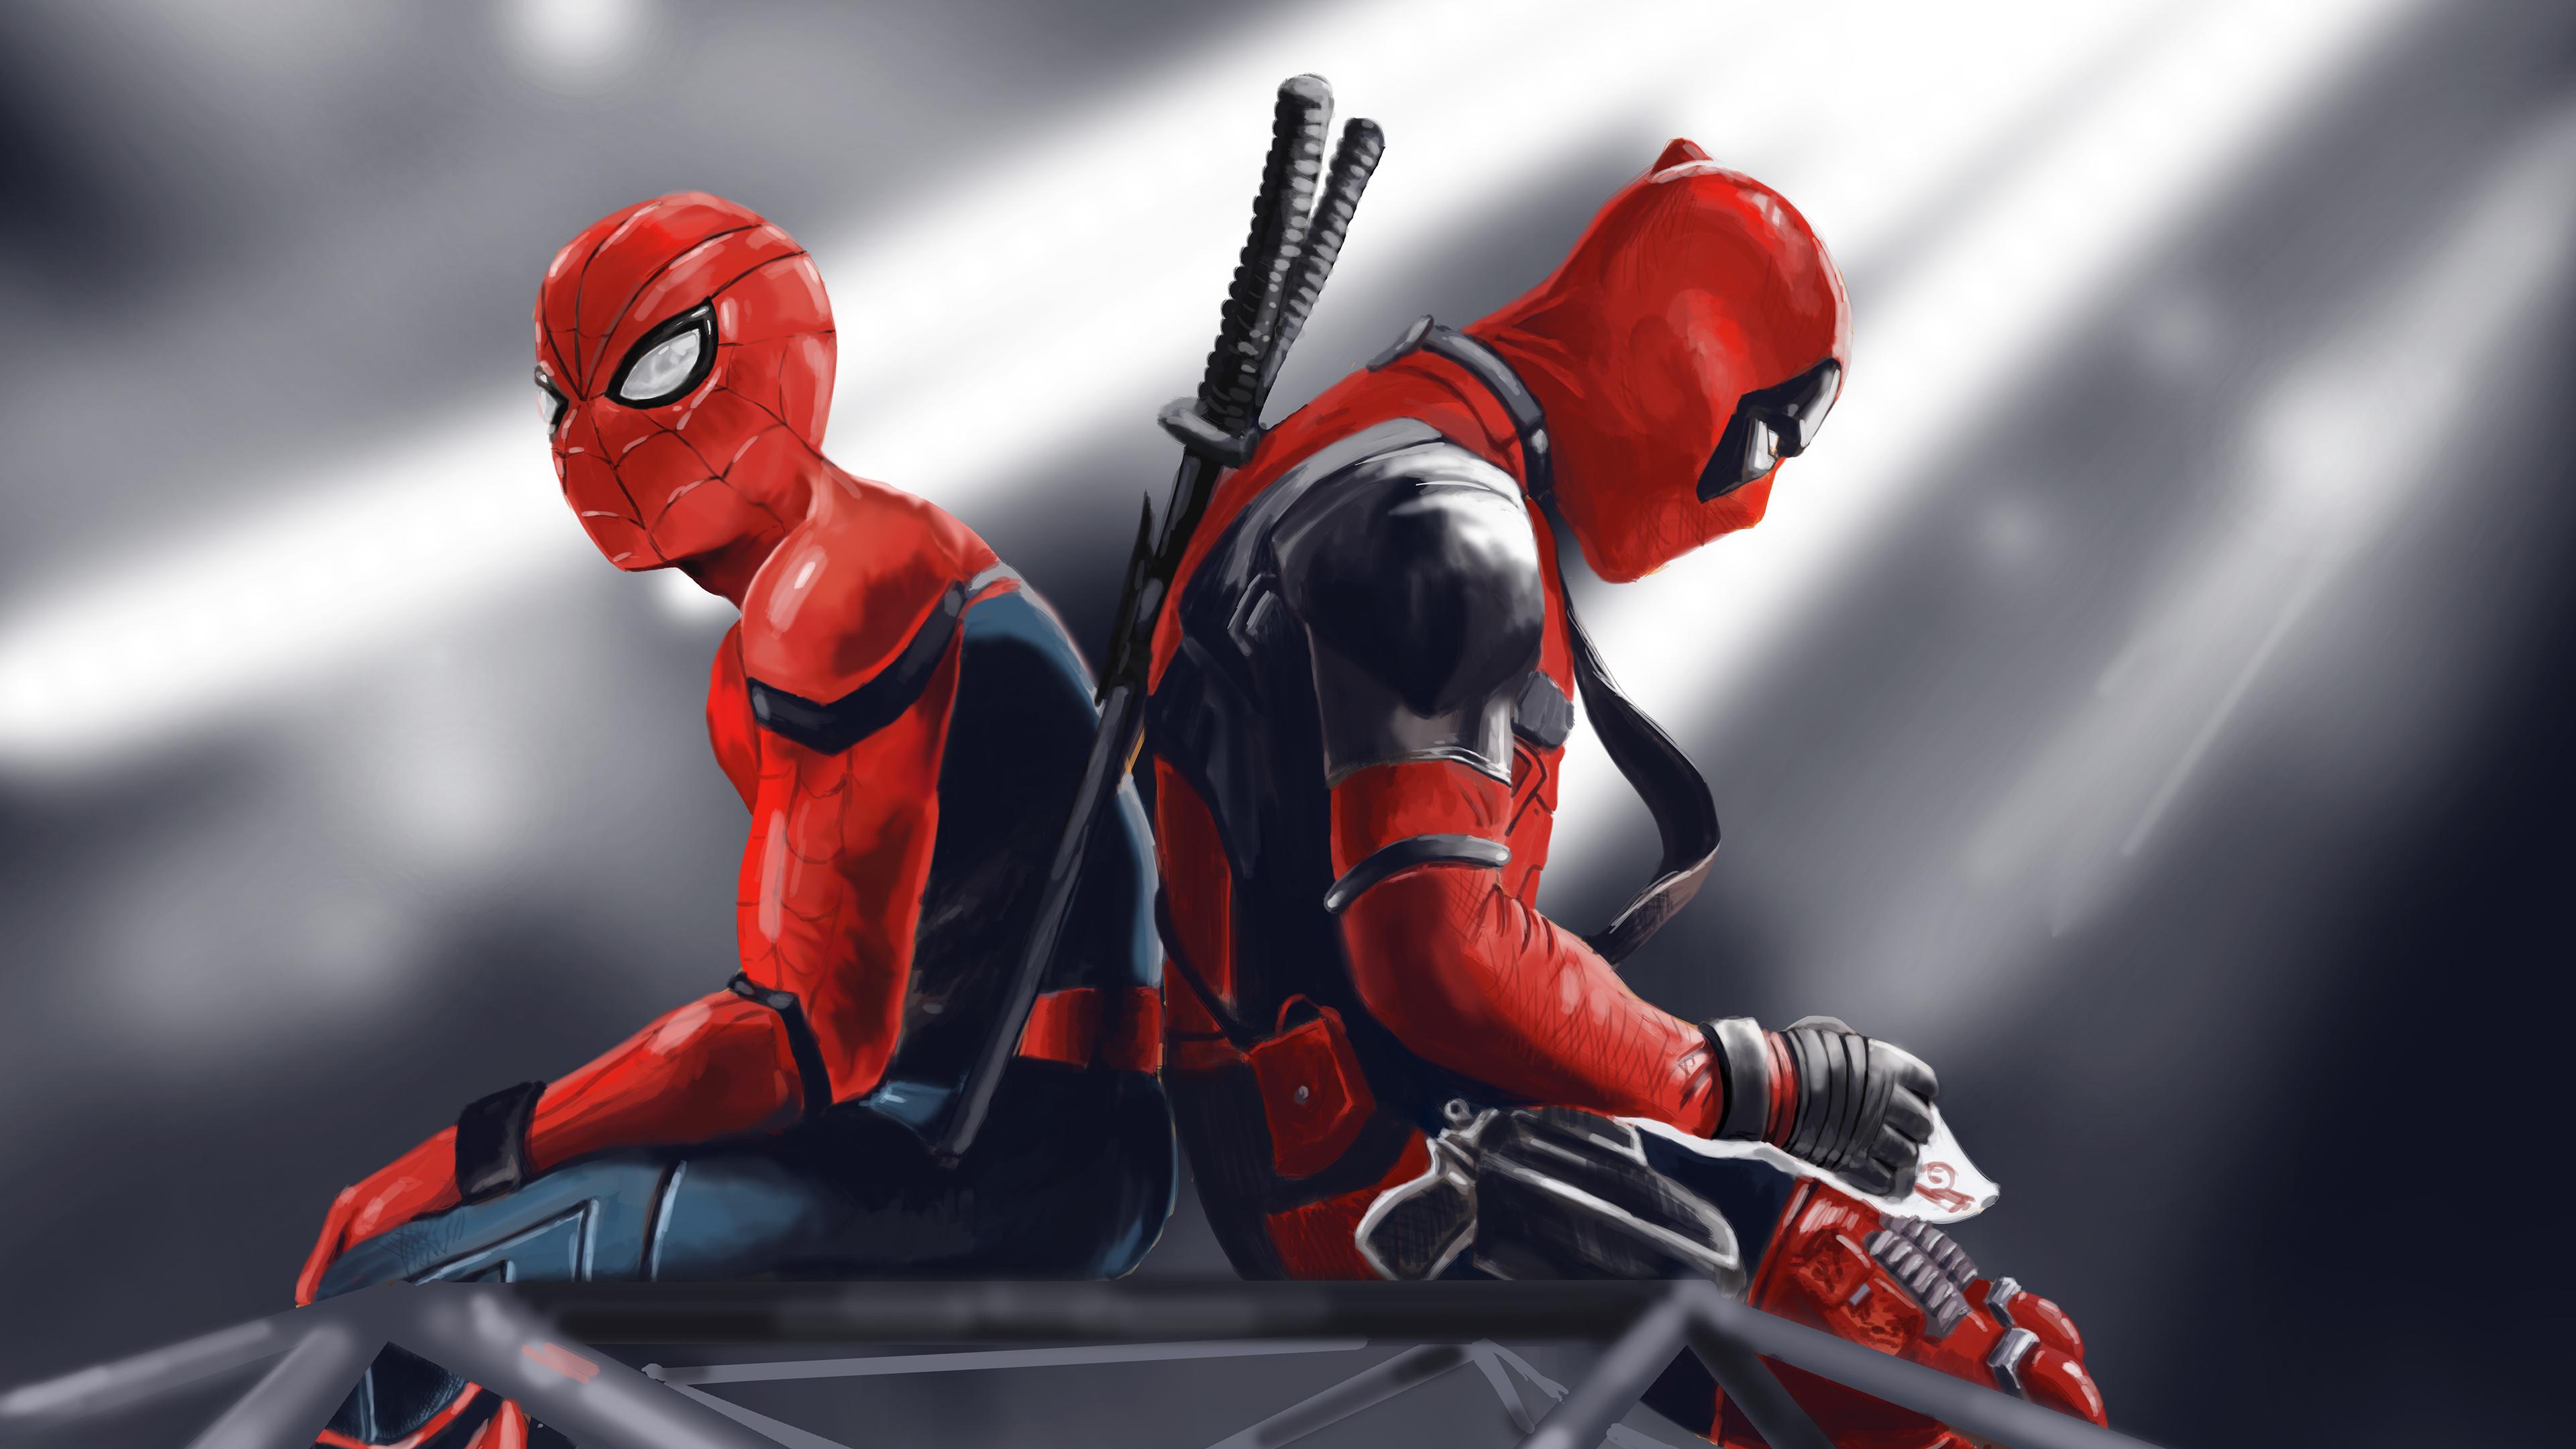 spidey and deadpool 1568054238 - Spidey And Deadpool - superheroes wallpapers, spiderman wallpapers, hd-wallpapers, deadpool wallpapers, behance wallpapers, artwork wallpapers, 4k-wallpapers